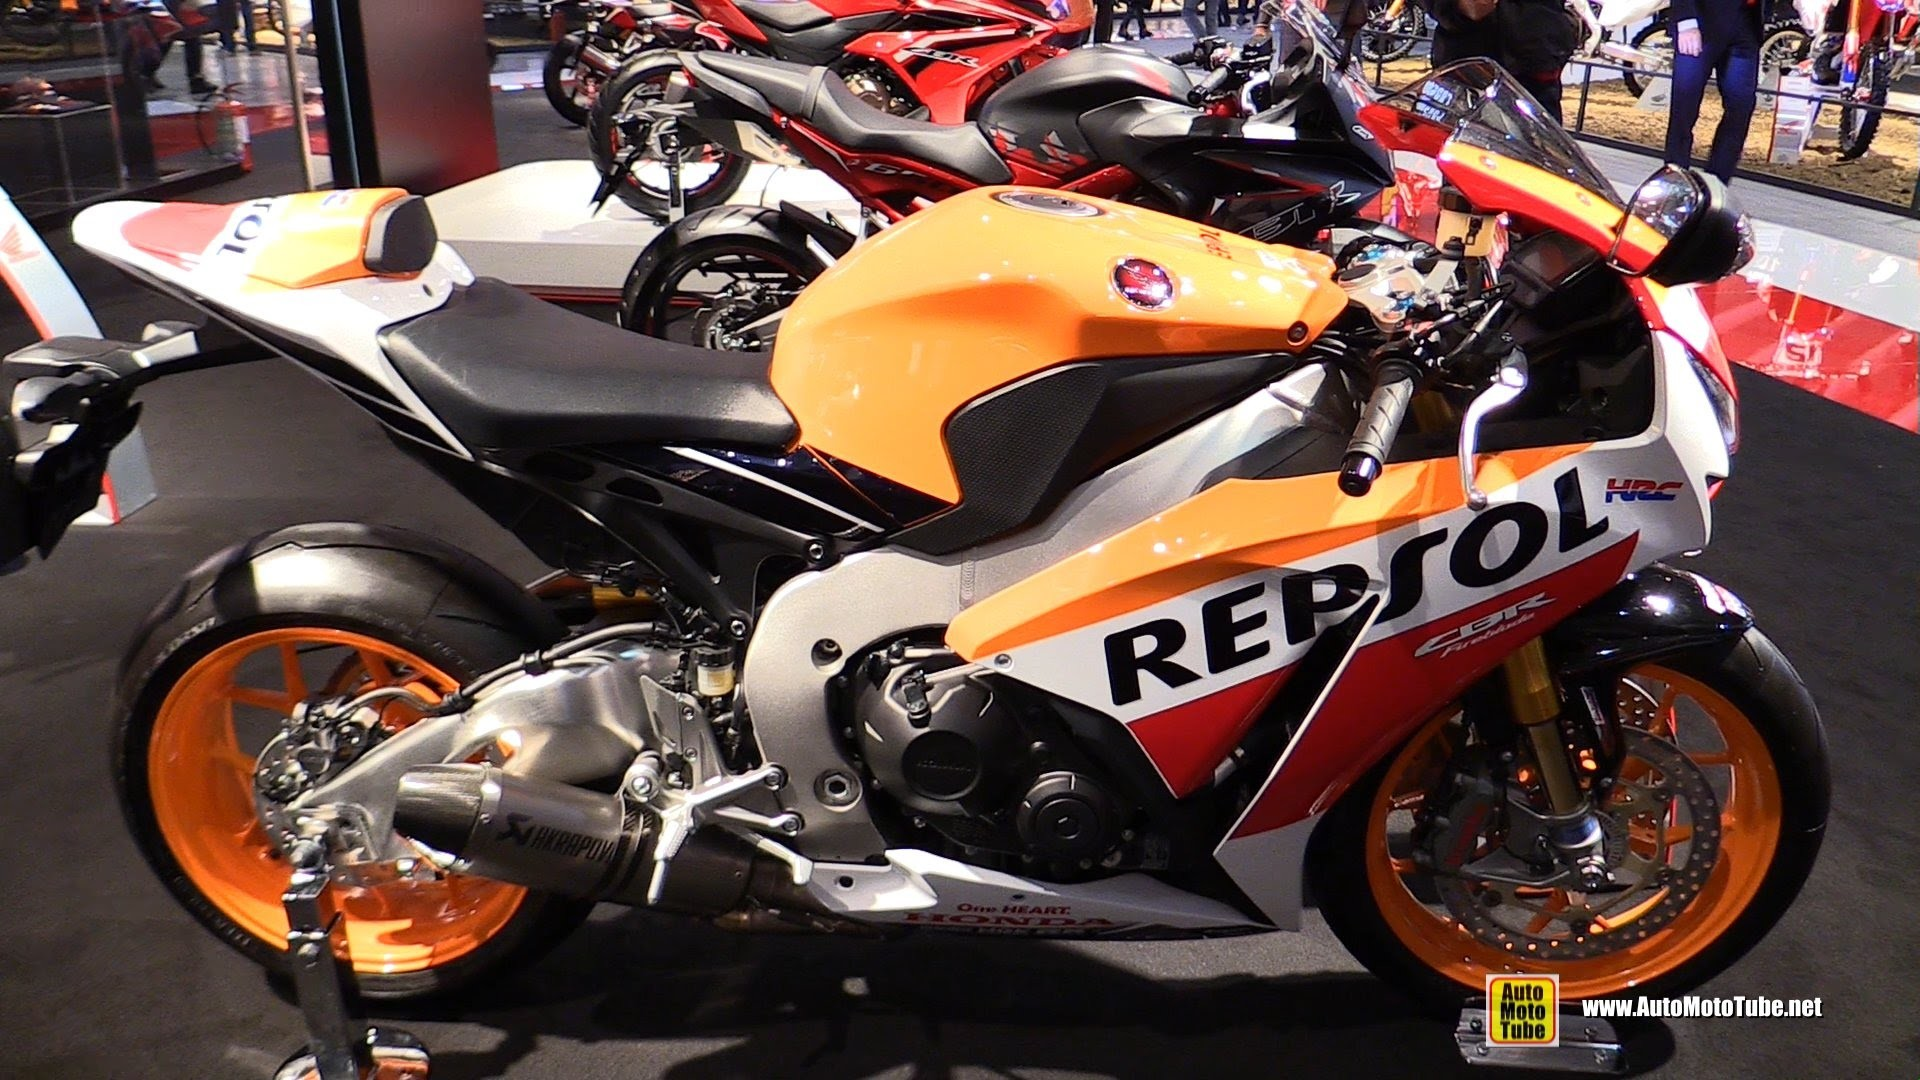 Res: 1920x1080, Honda Cbr1000rr Sp Fireblade Wallpapers Wide